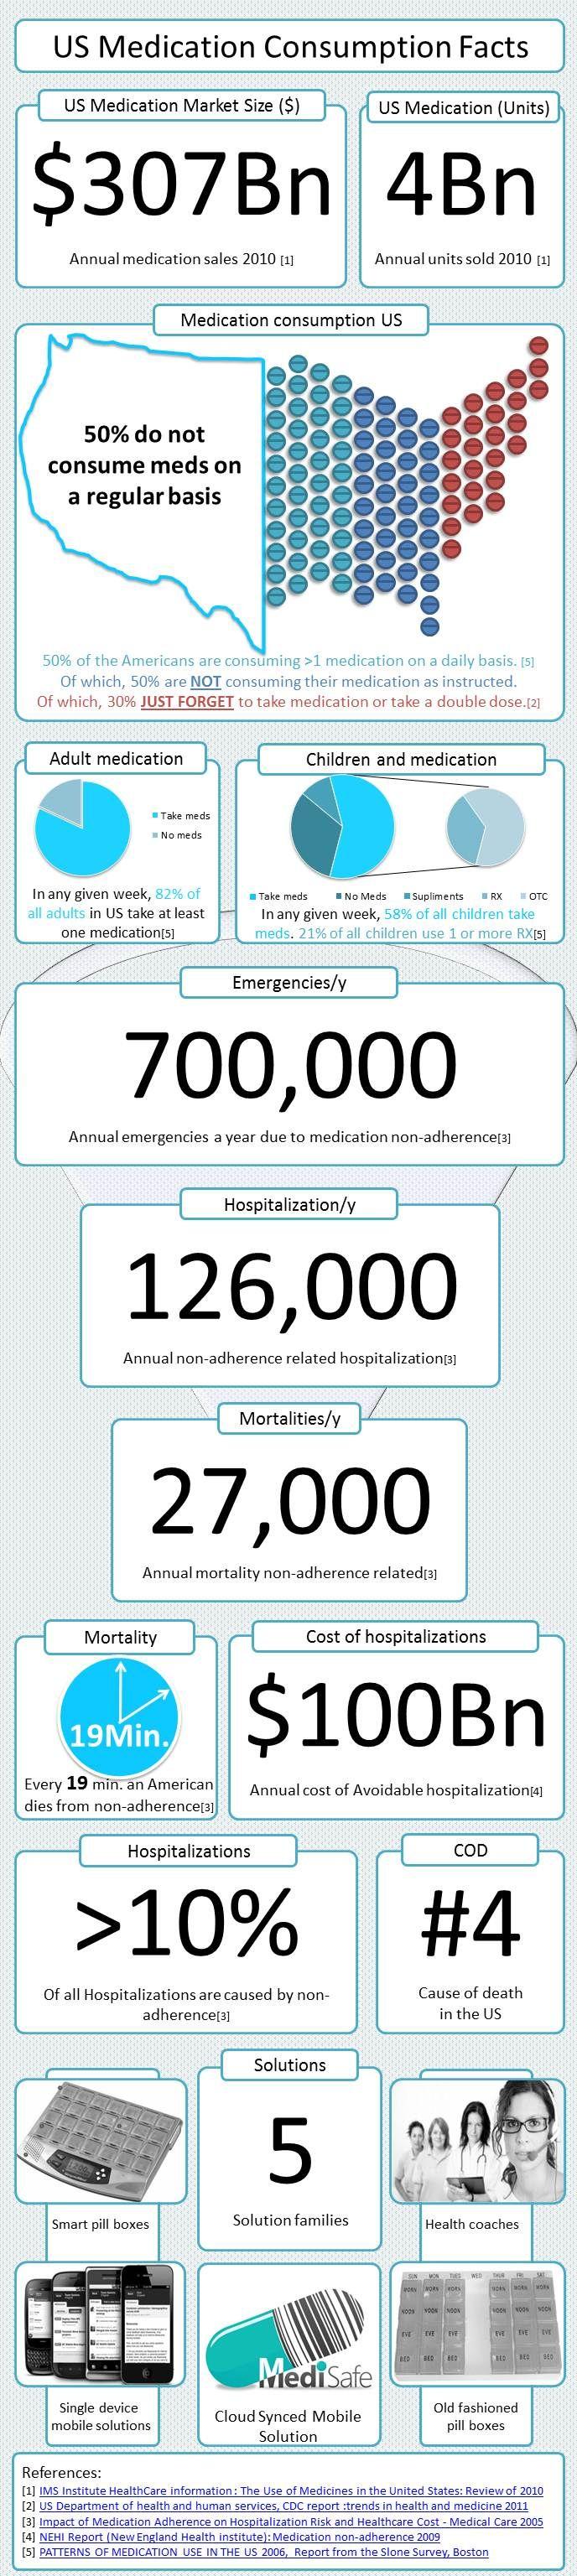 Medication consumption and non-adherence #epill